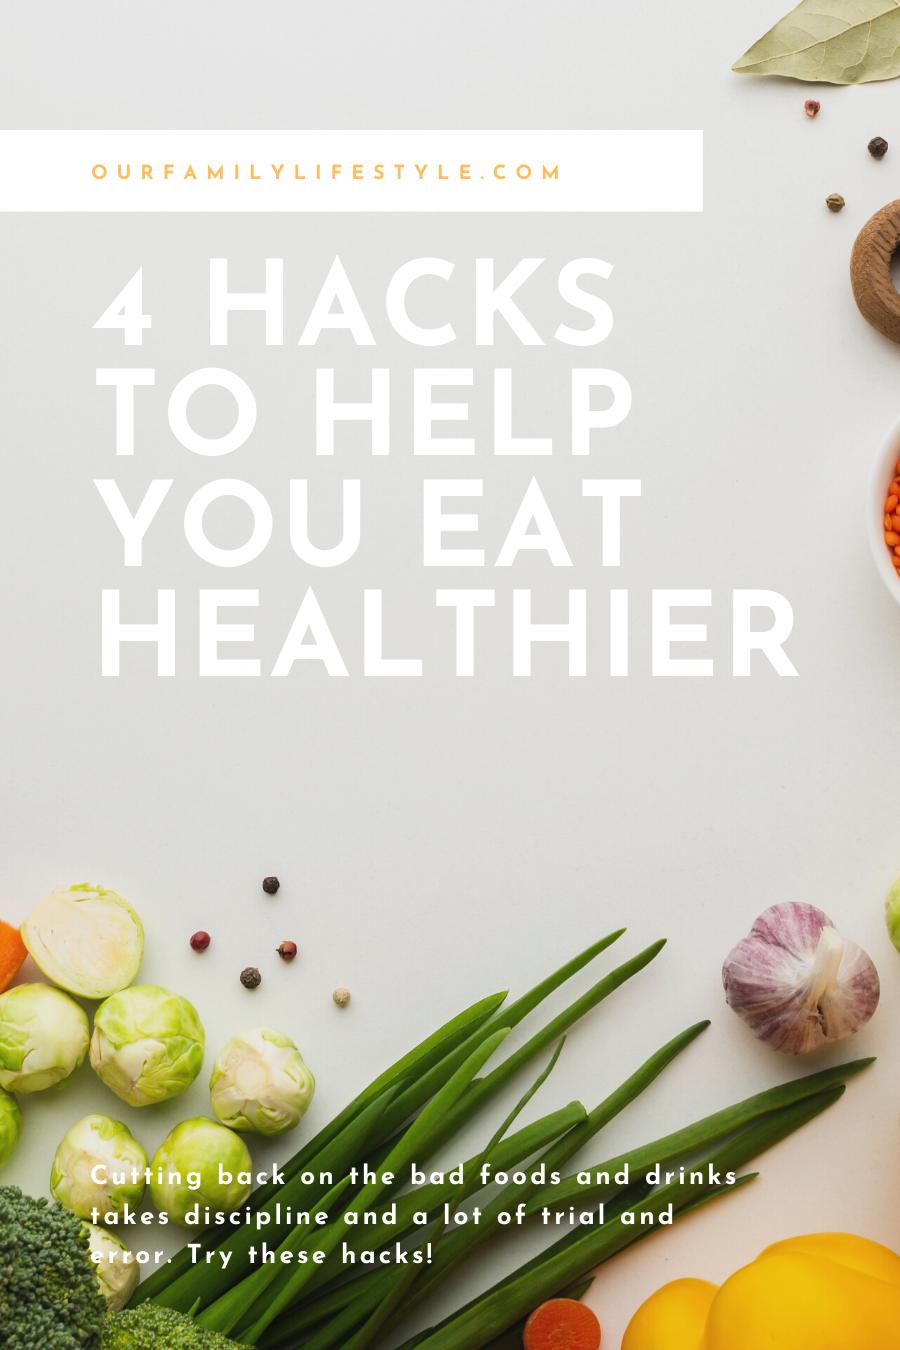 4 Hacks To Help You Eat Healthier